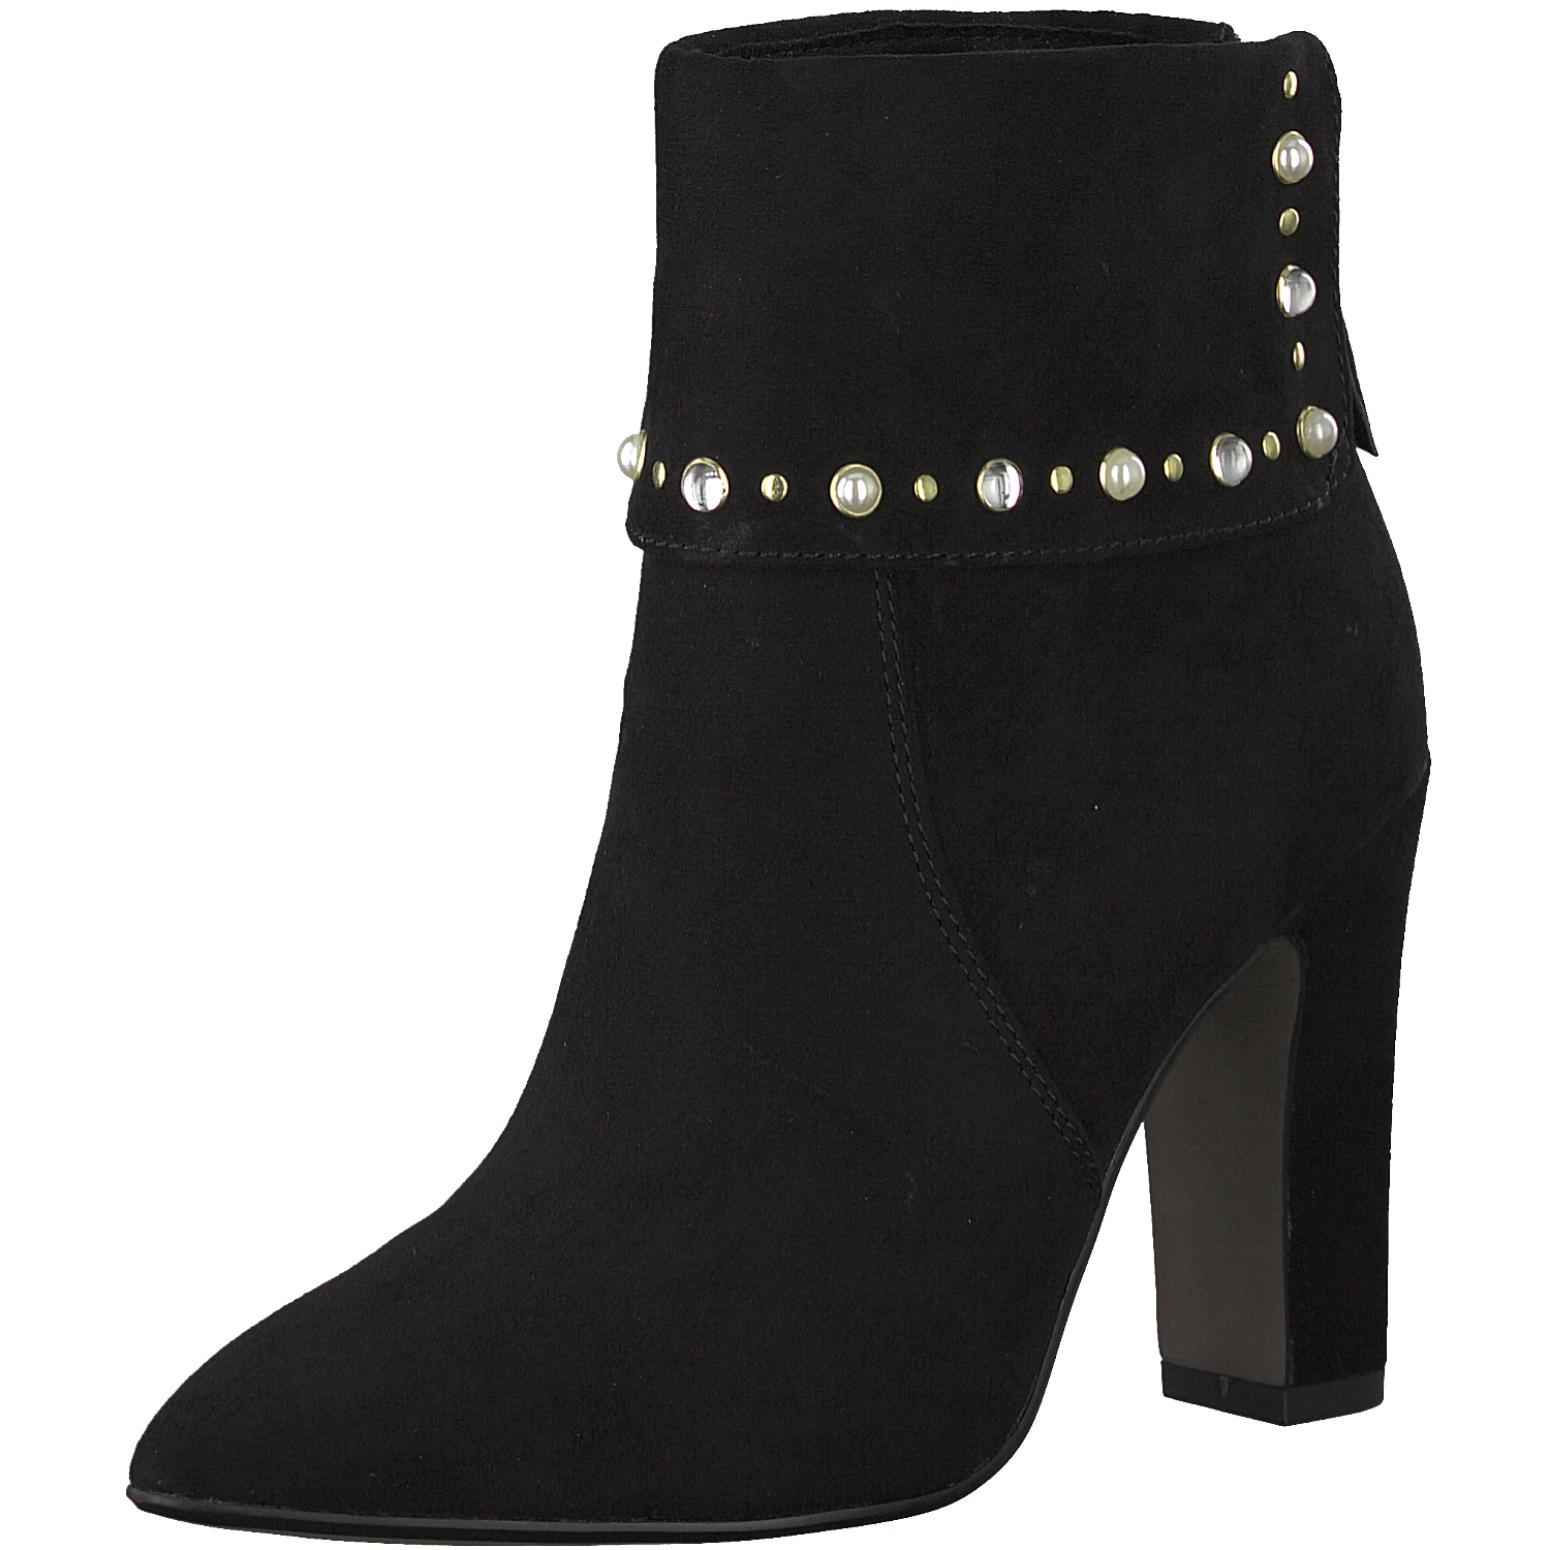 Tamaris 1 25359 21 Schuhe Damen Stiefeletten High High Stiefeletten Heel Ankle Stiefel ... d825ec